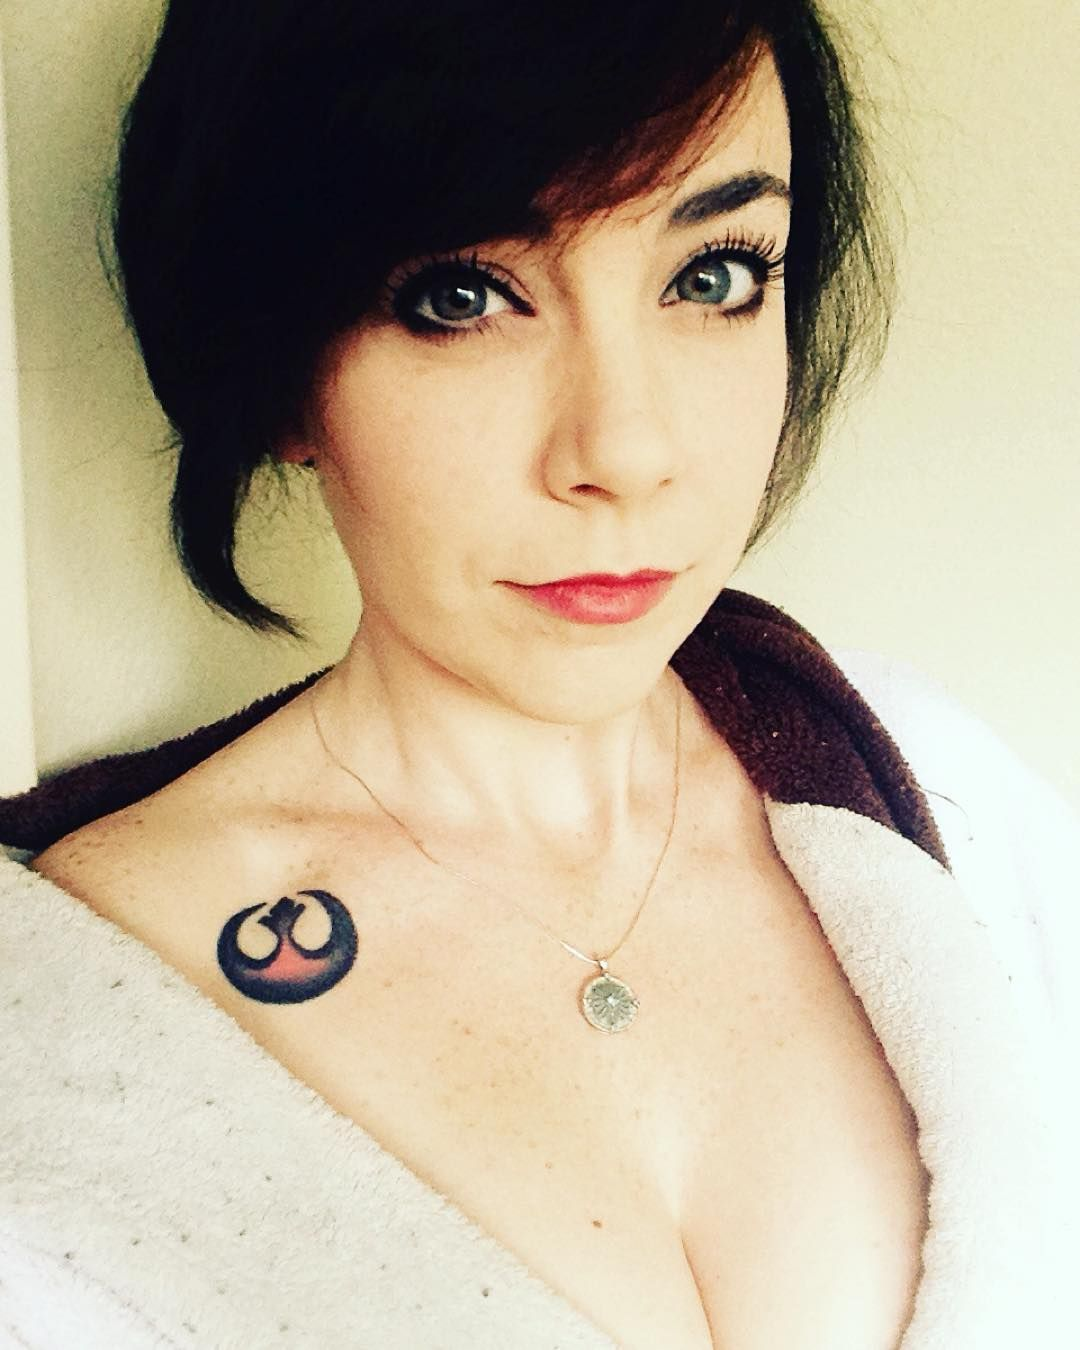 tatouage star wars discret